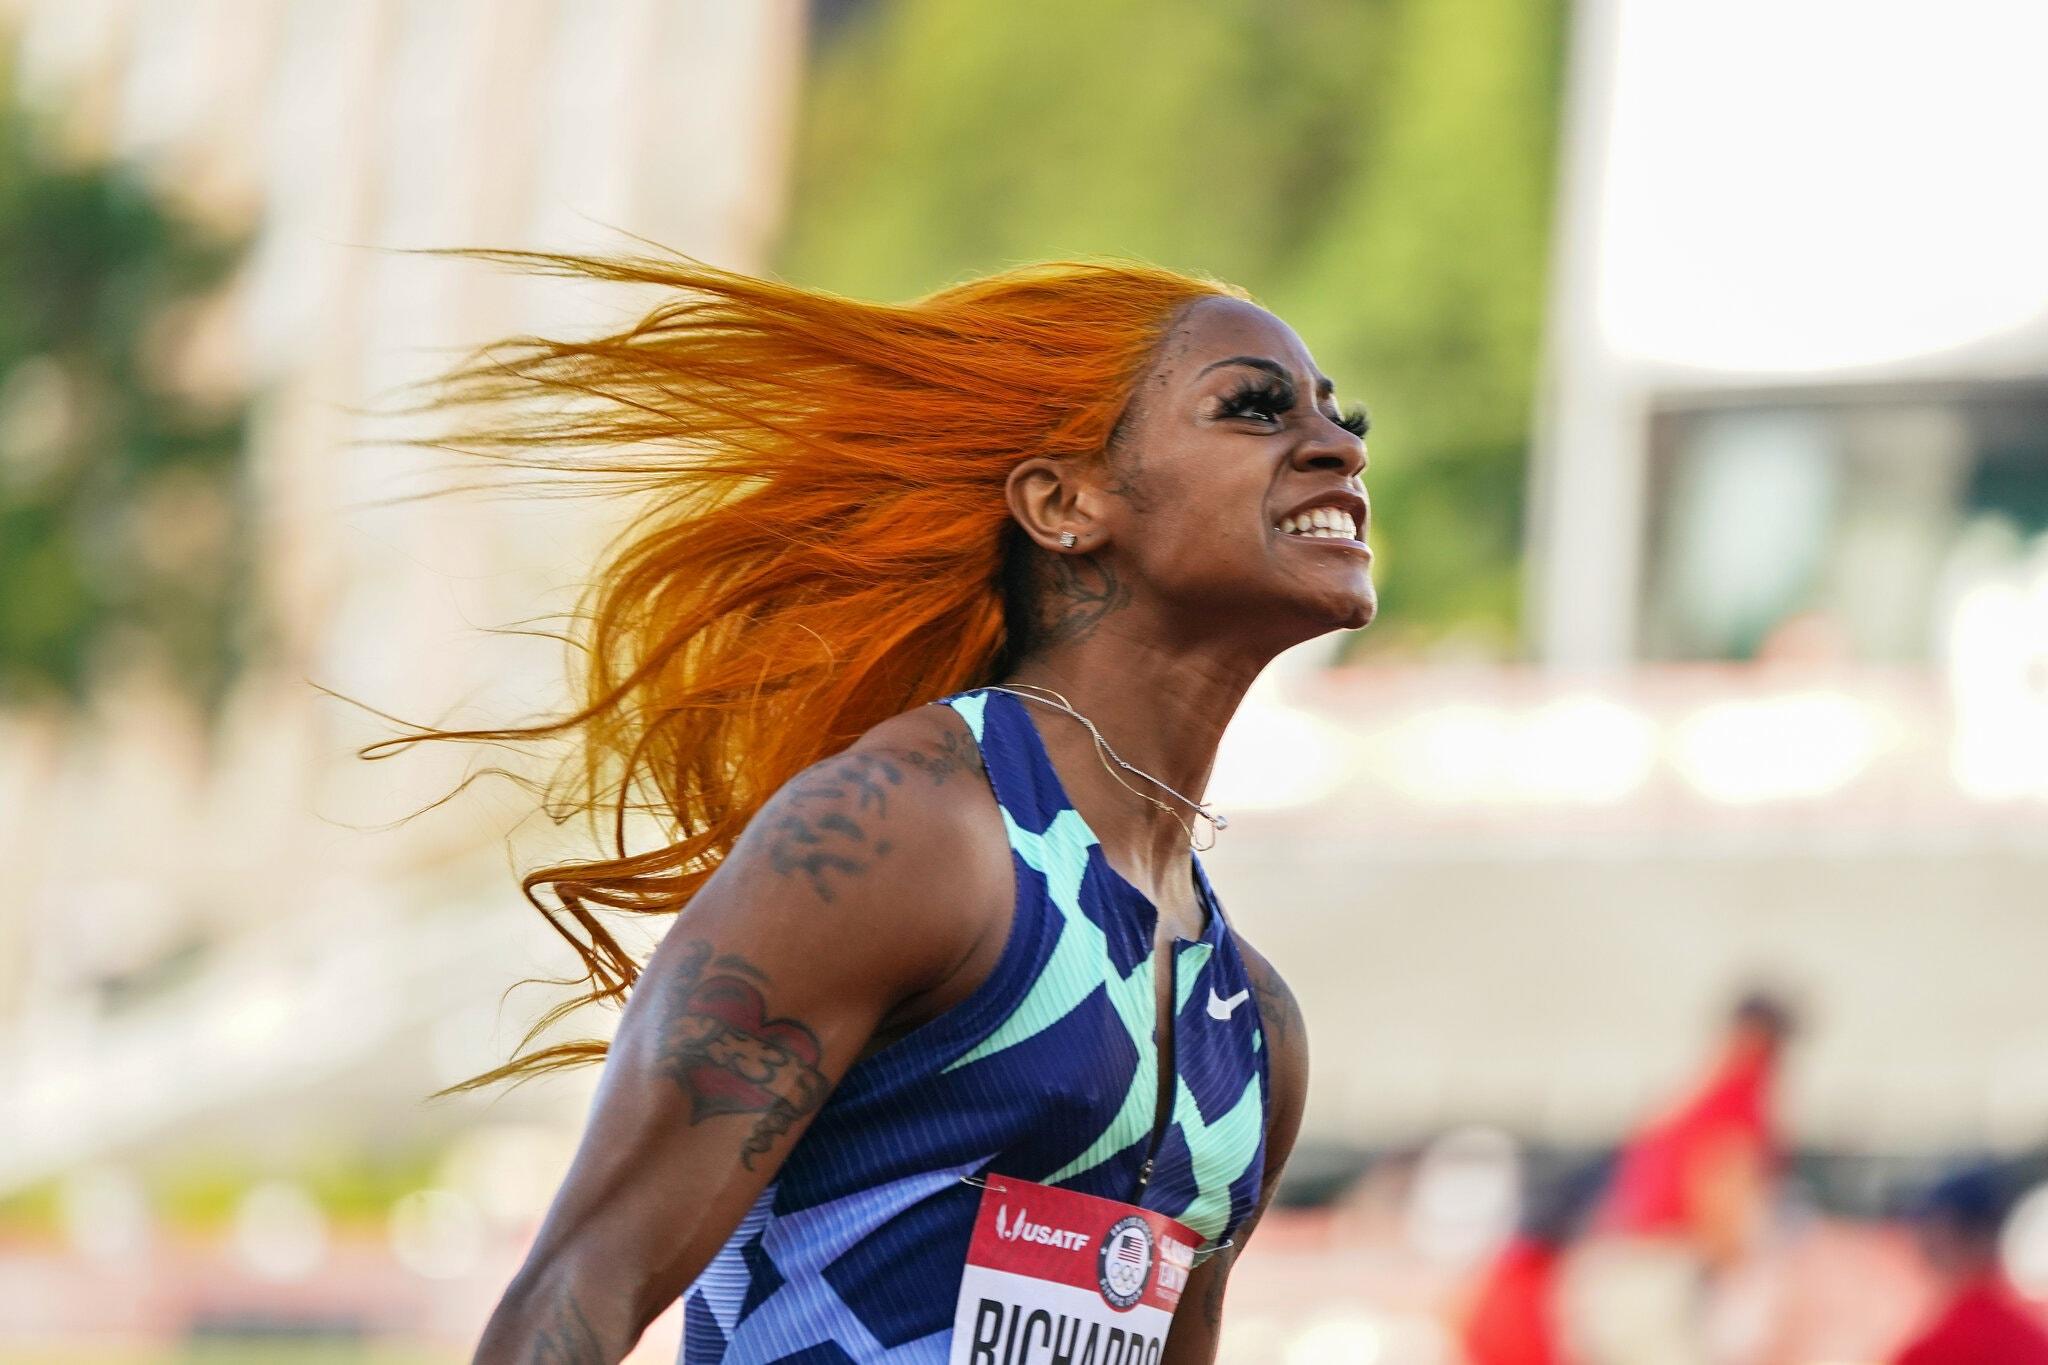 Sprinter Sha'Carri Richardson left off US Olympic